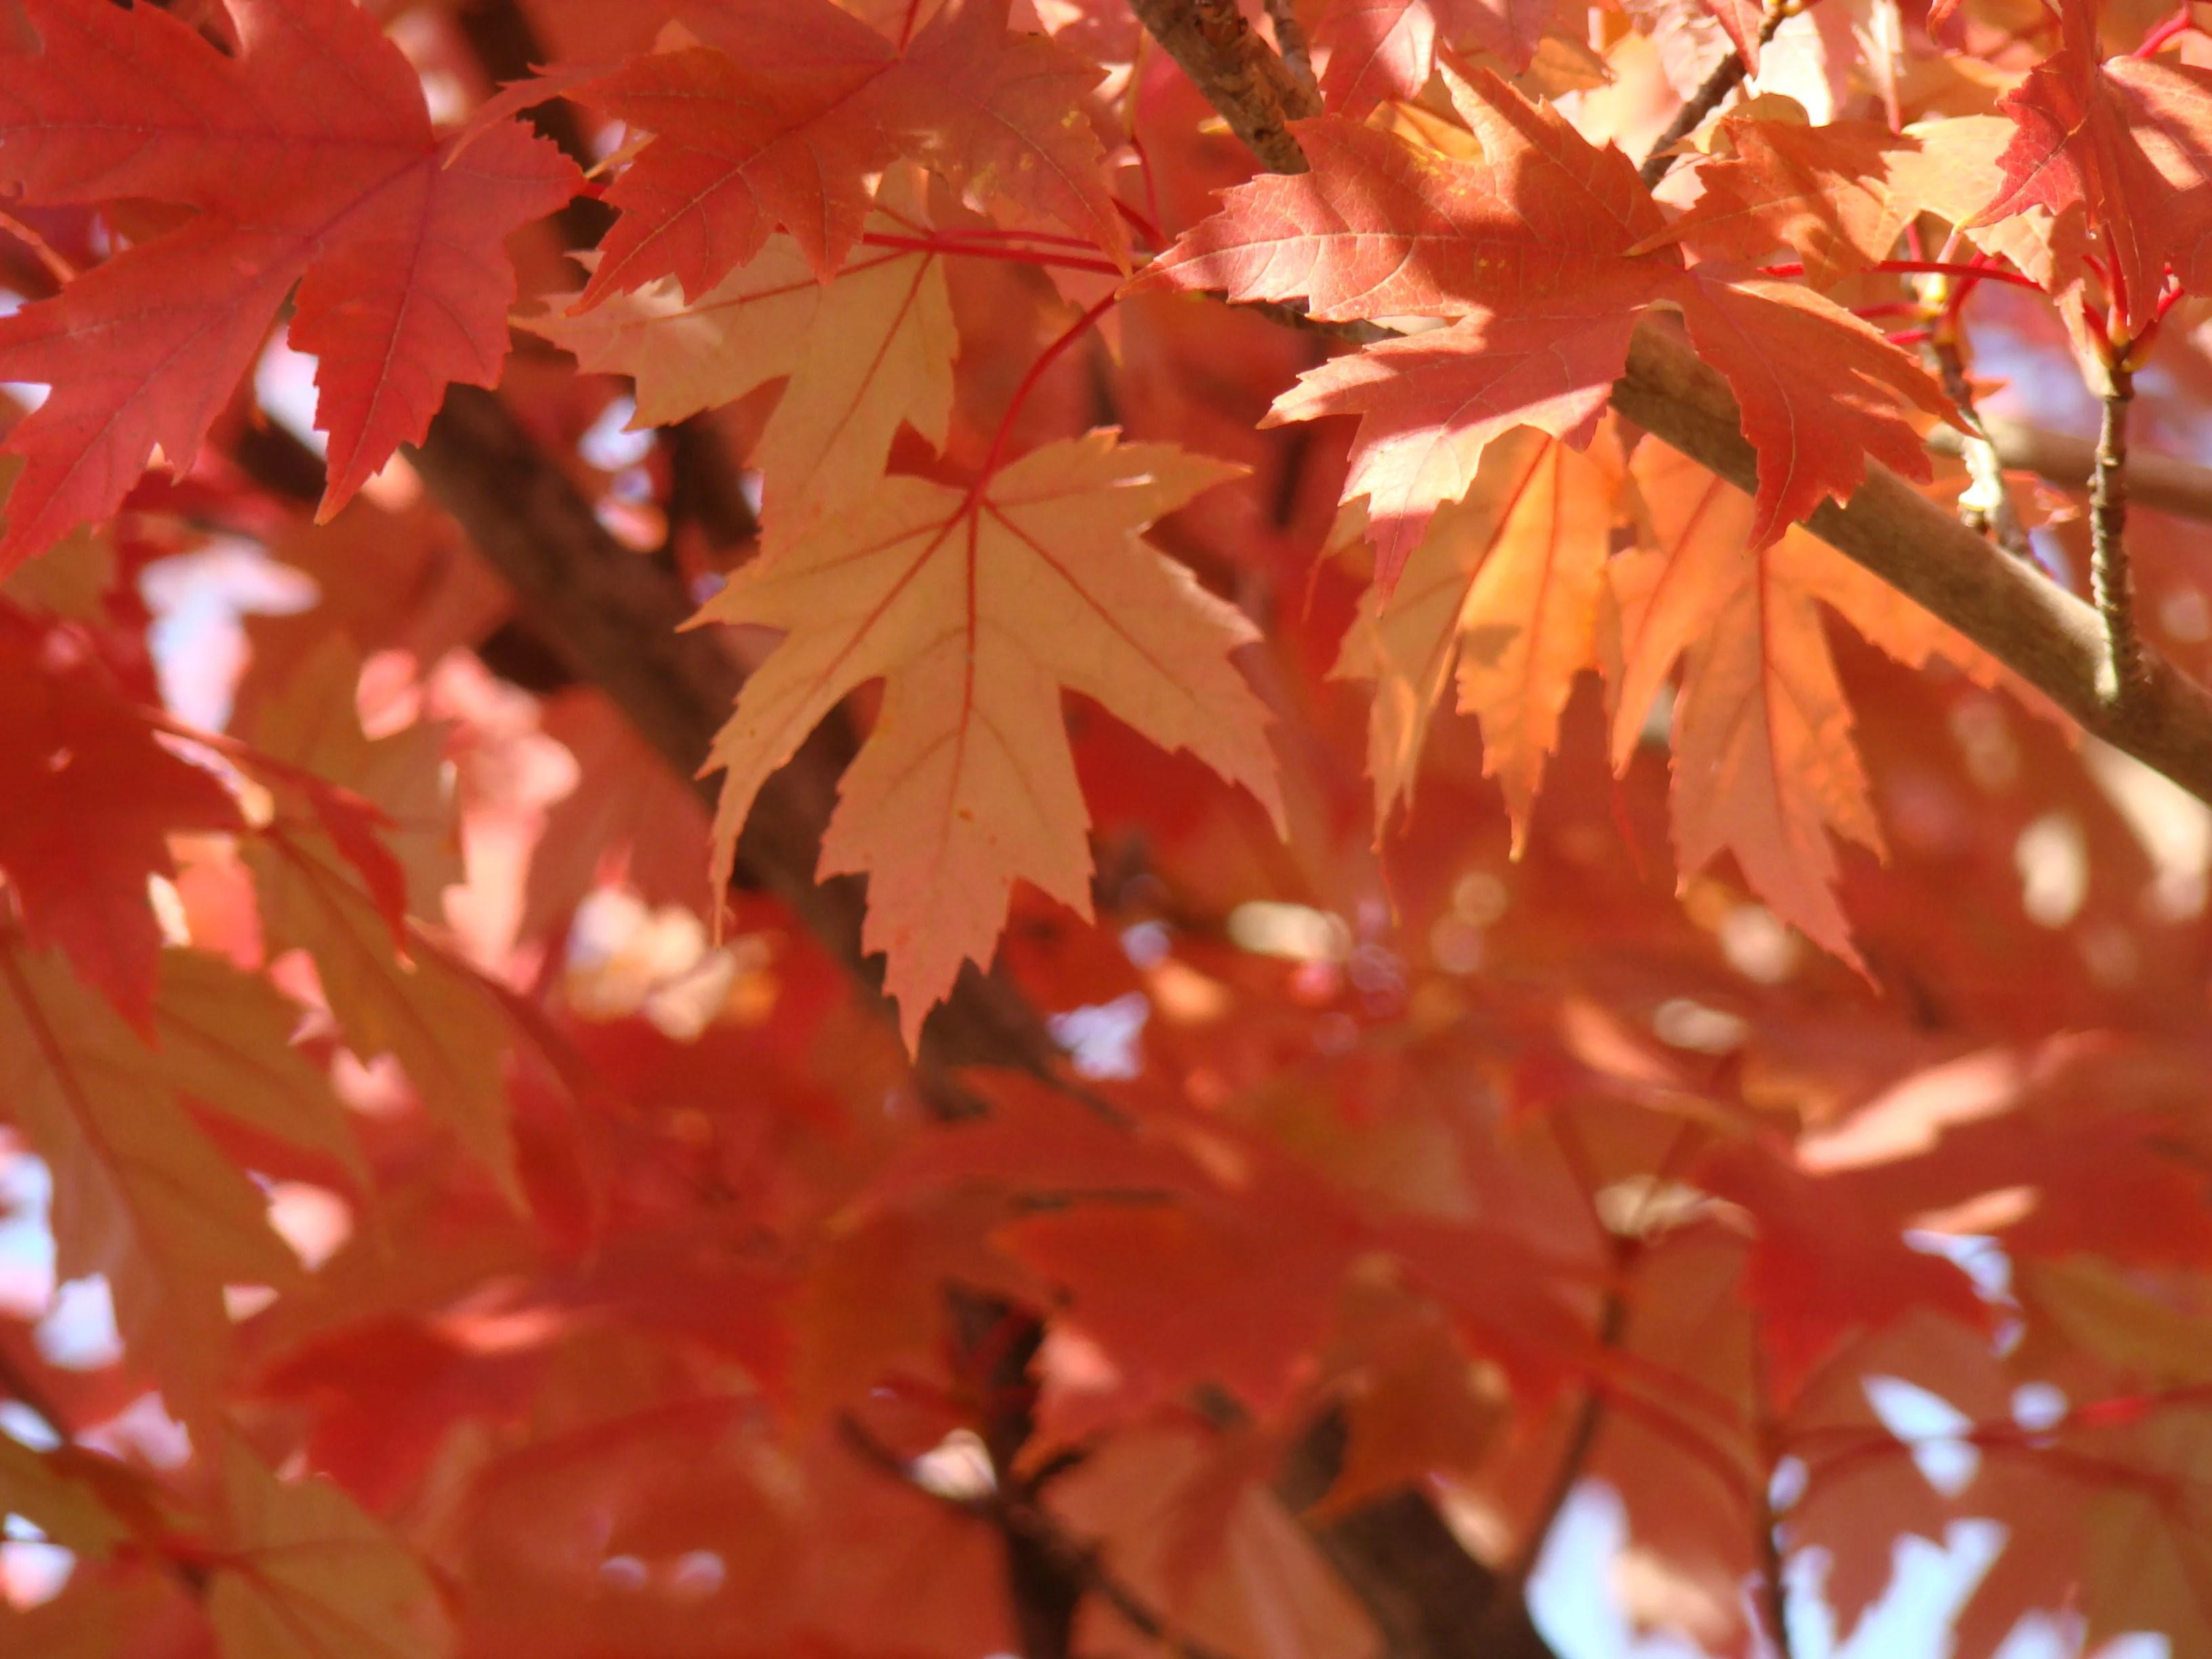 Birch Tree Fall Wallpaper Fall Trees Art Prints Gifts Orange Autumn Leaves Baslee